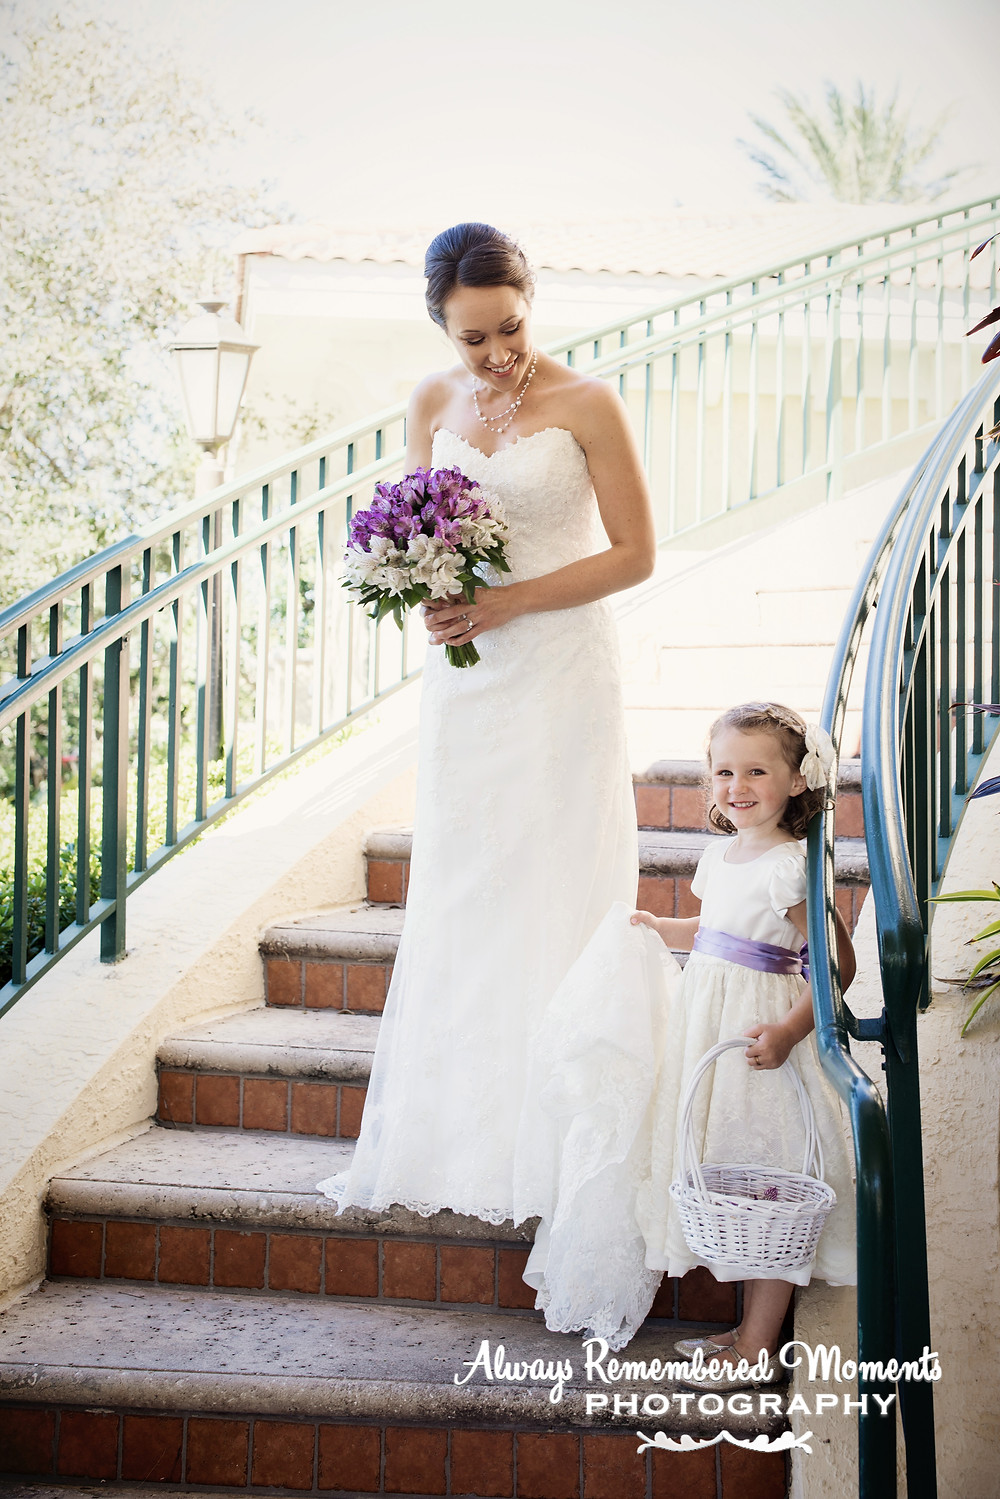 Traditional Bride & Flowergirl Portrait